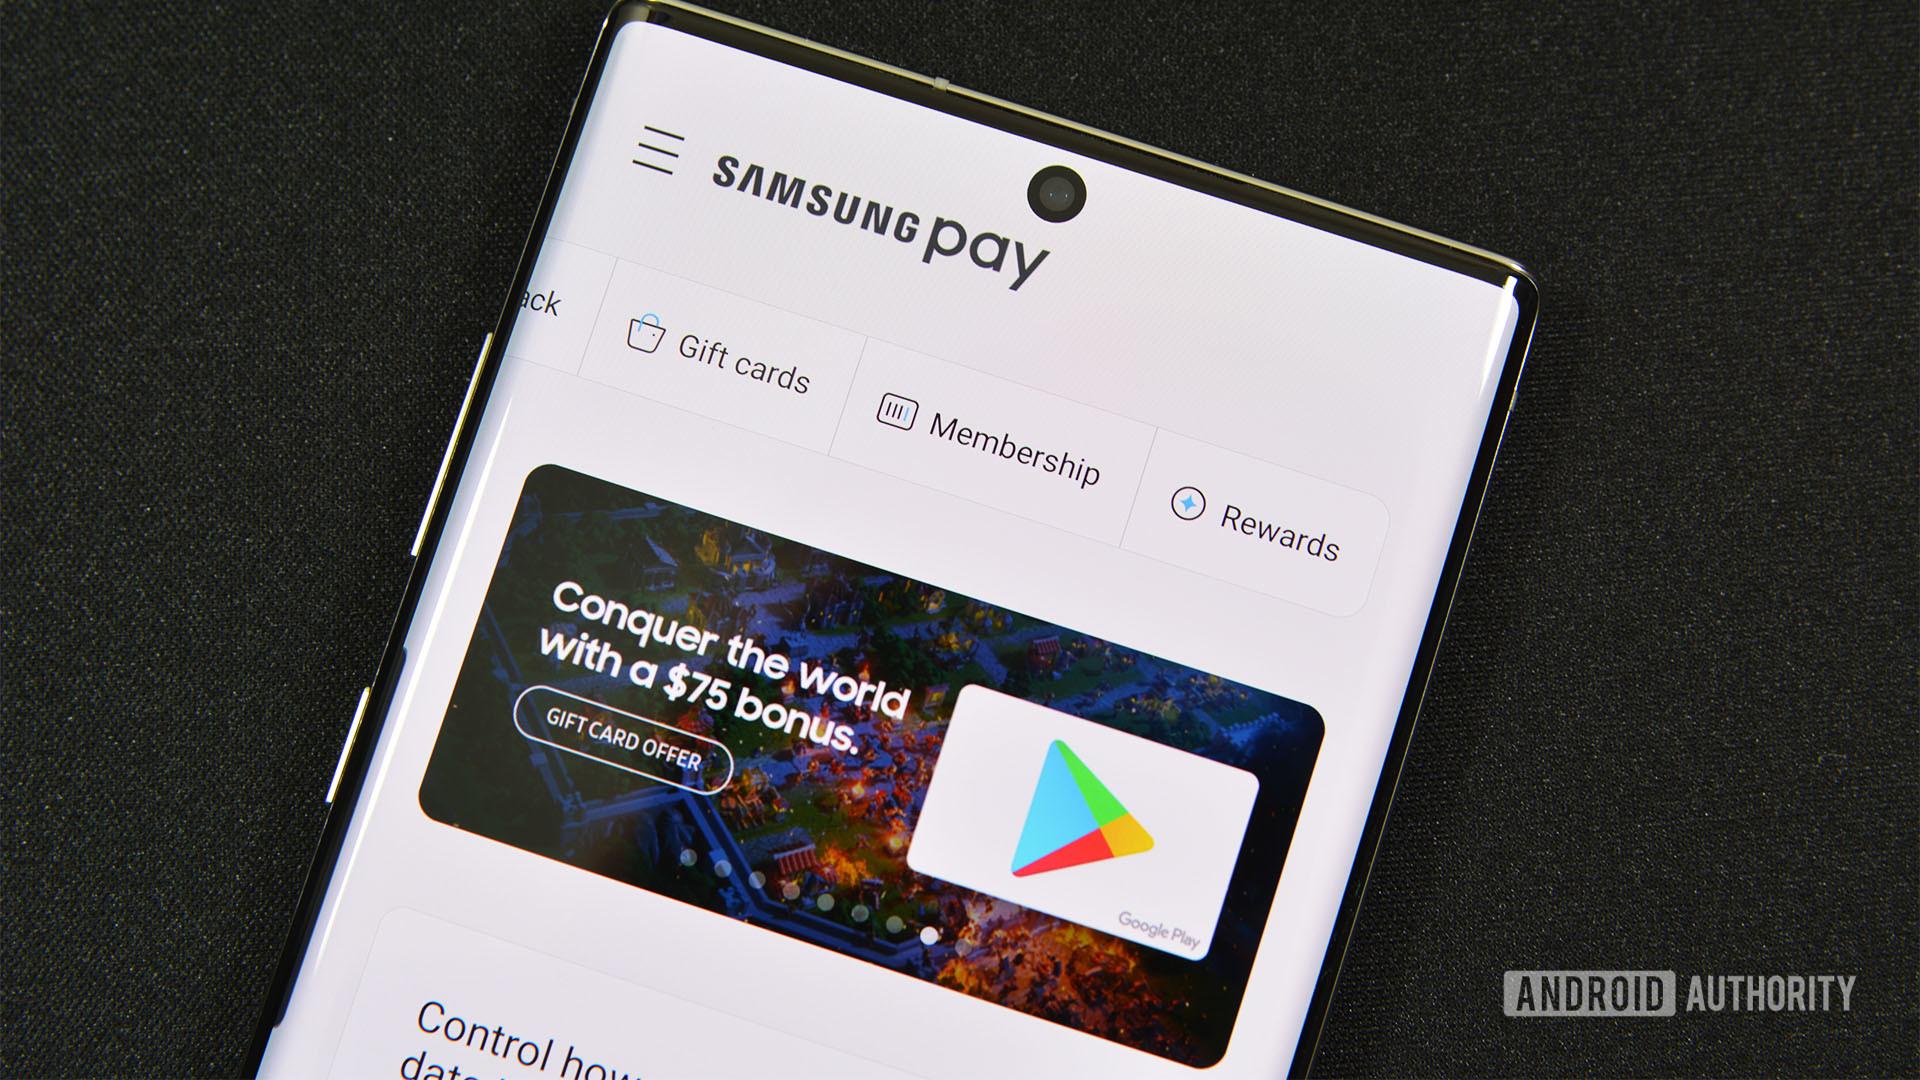 Samsung Pay main screen